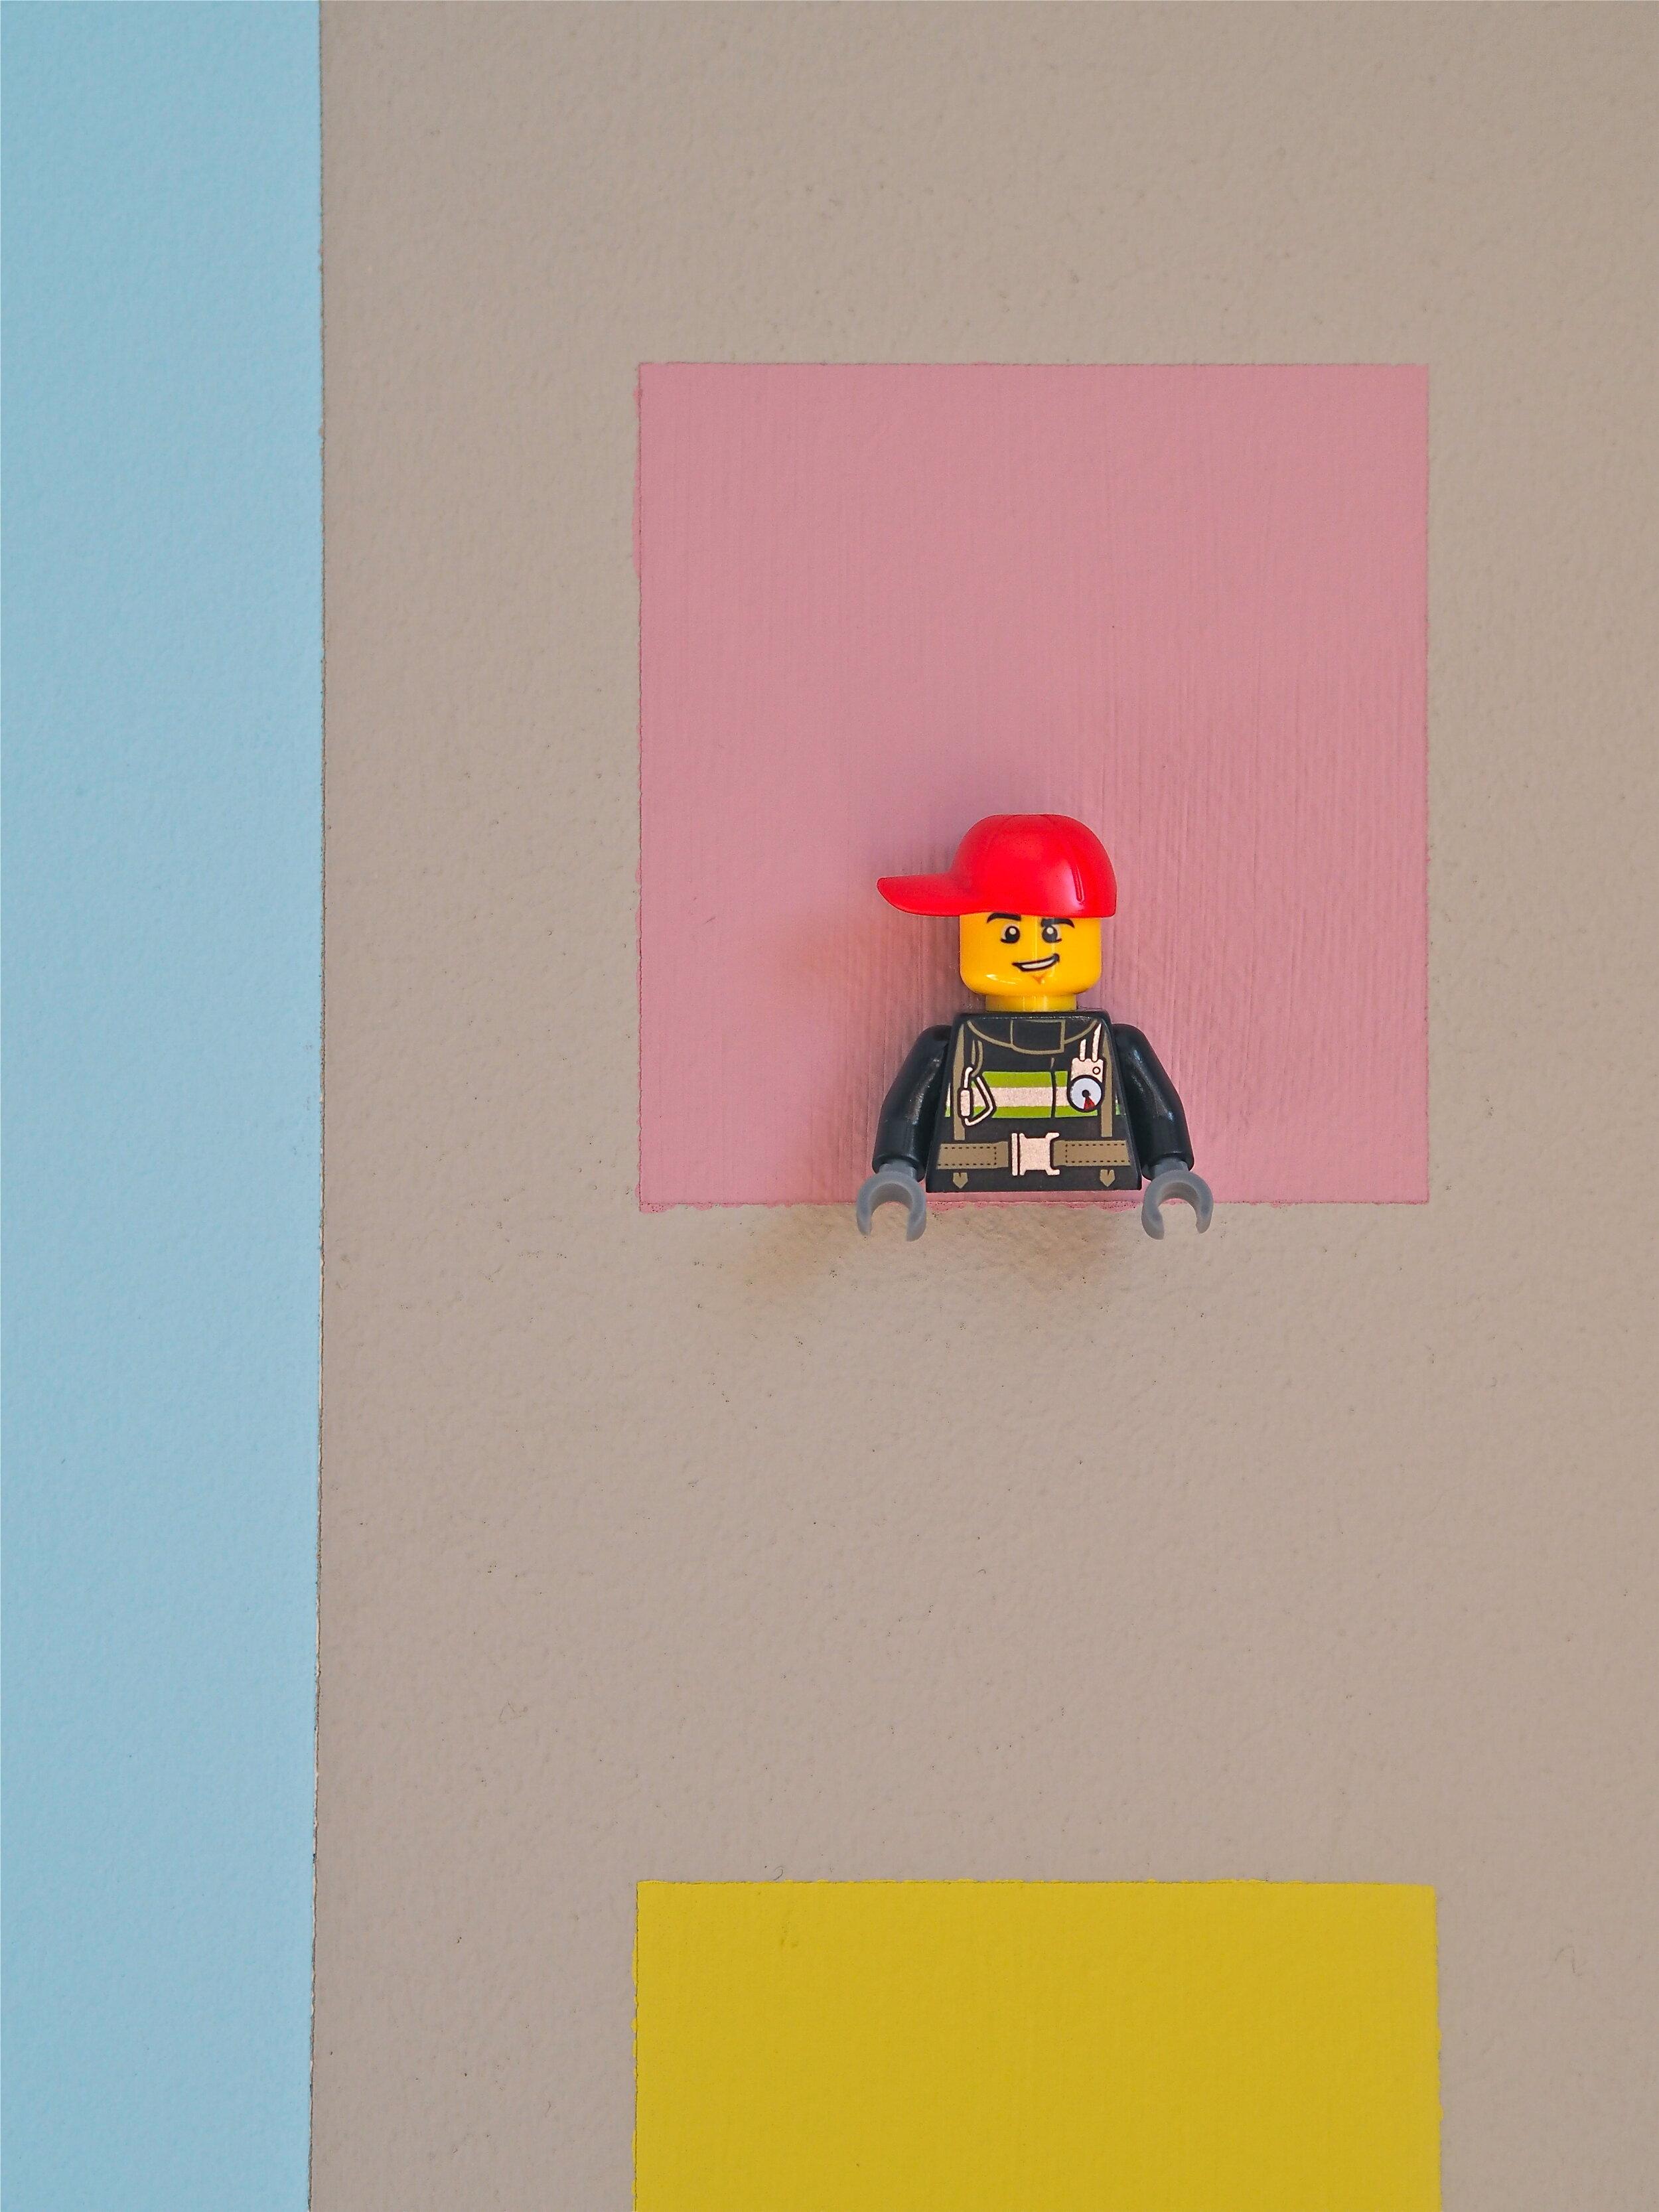 Lego figure wall mural